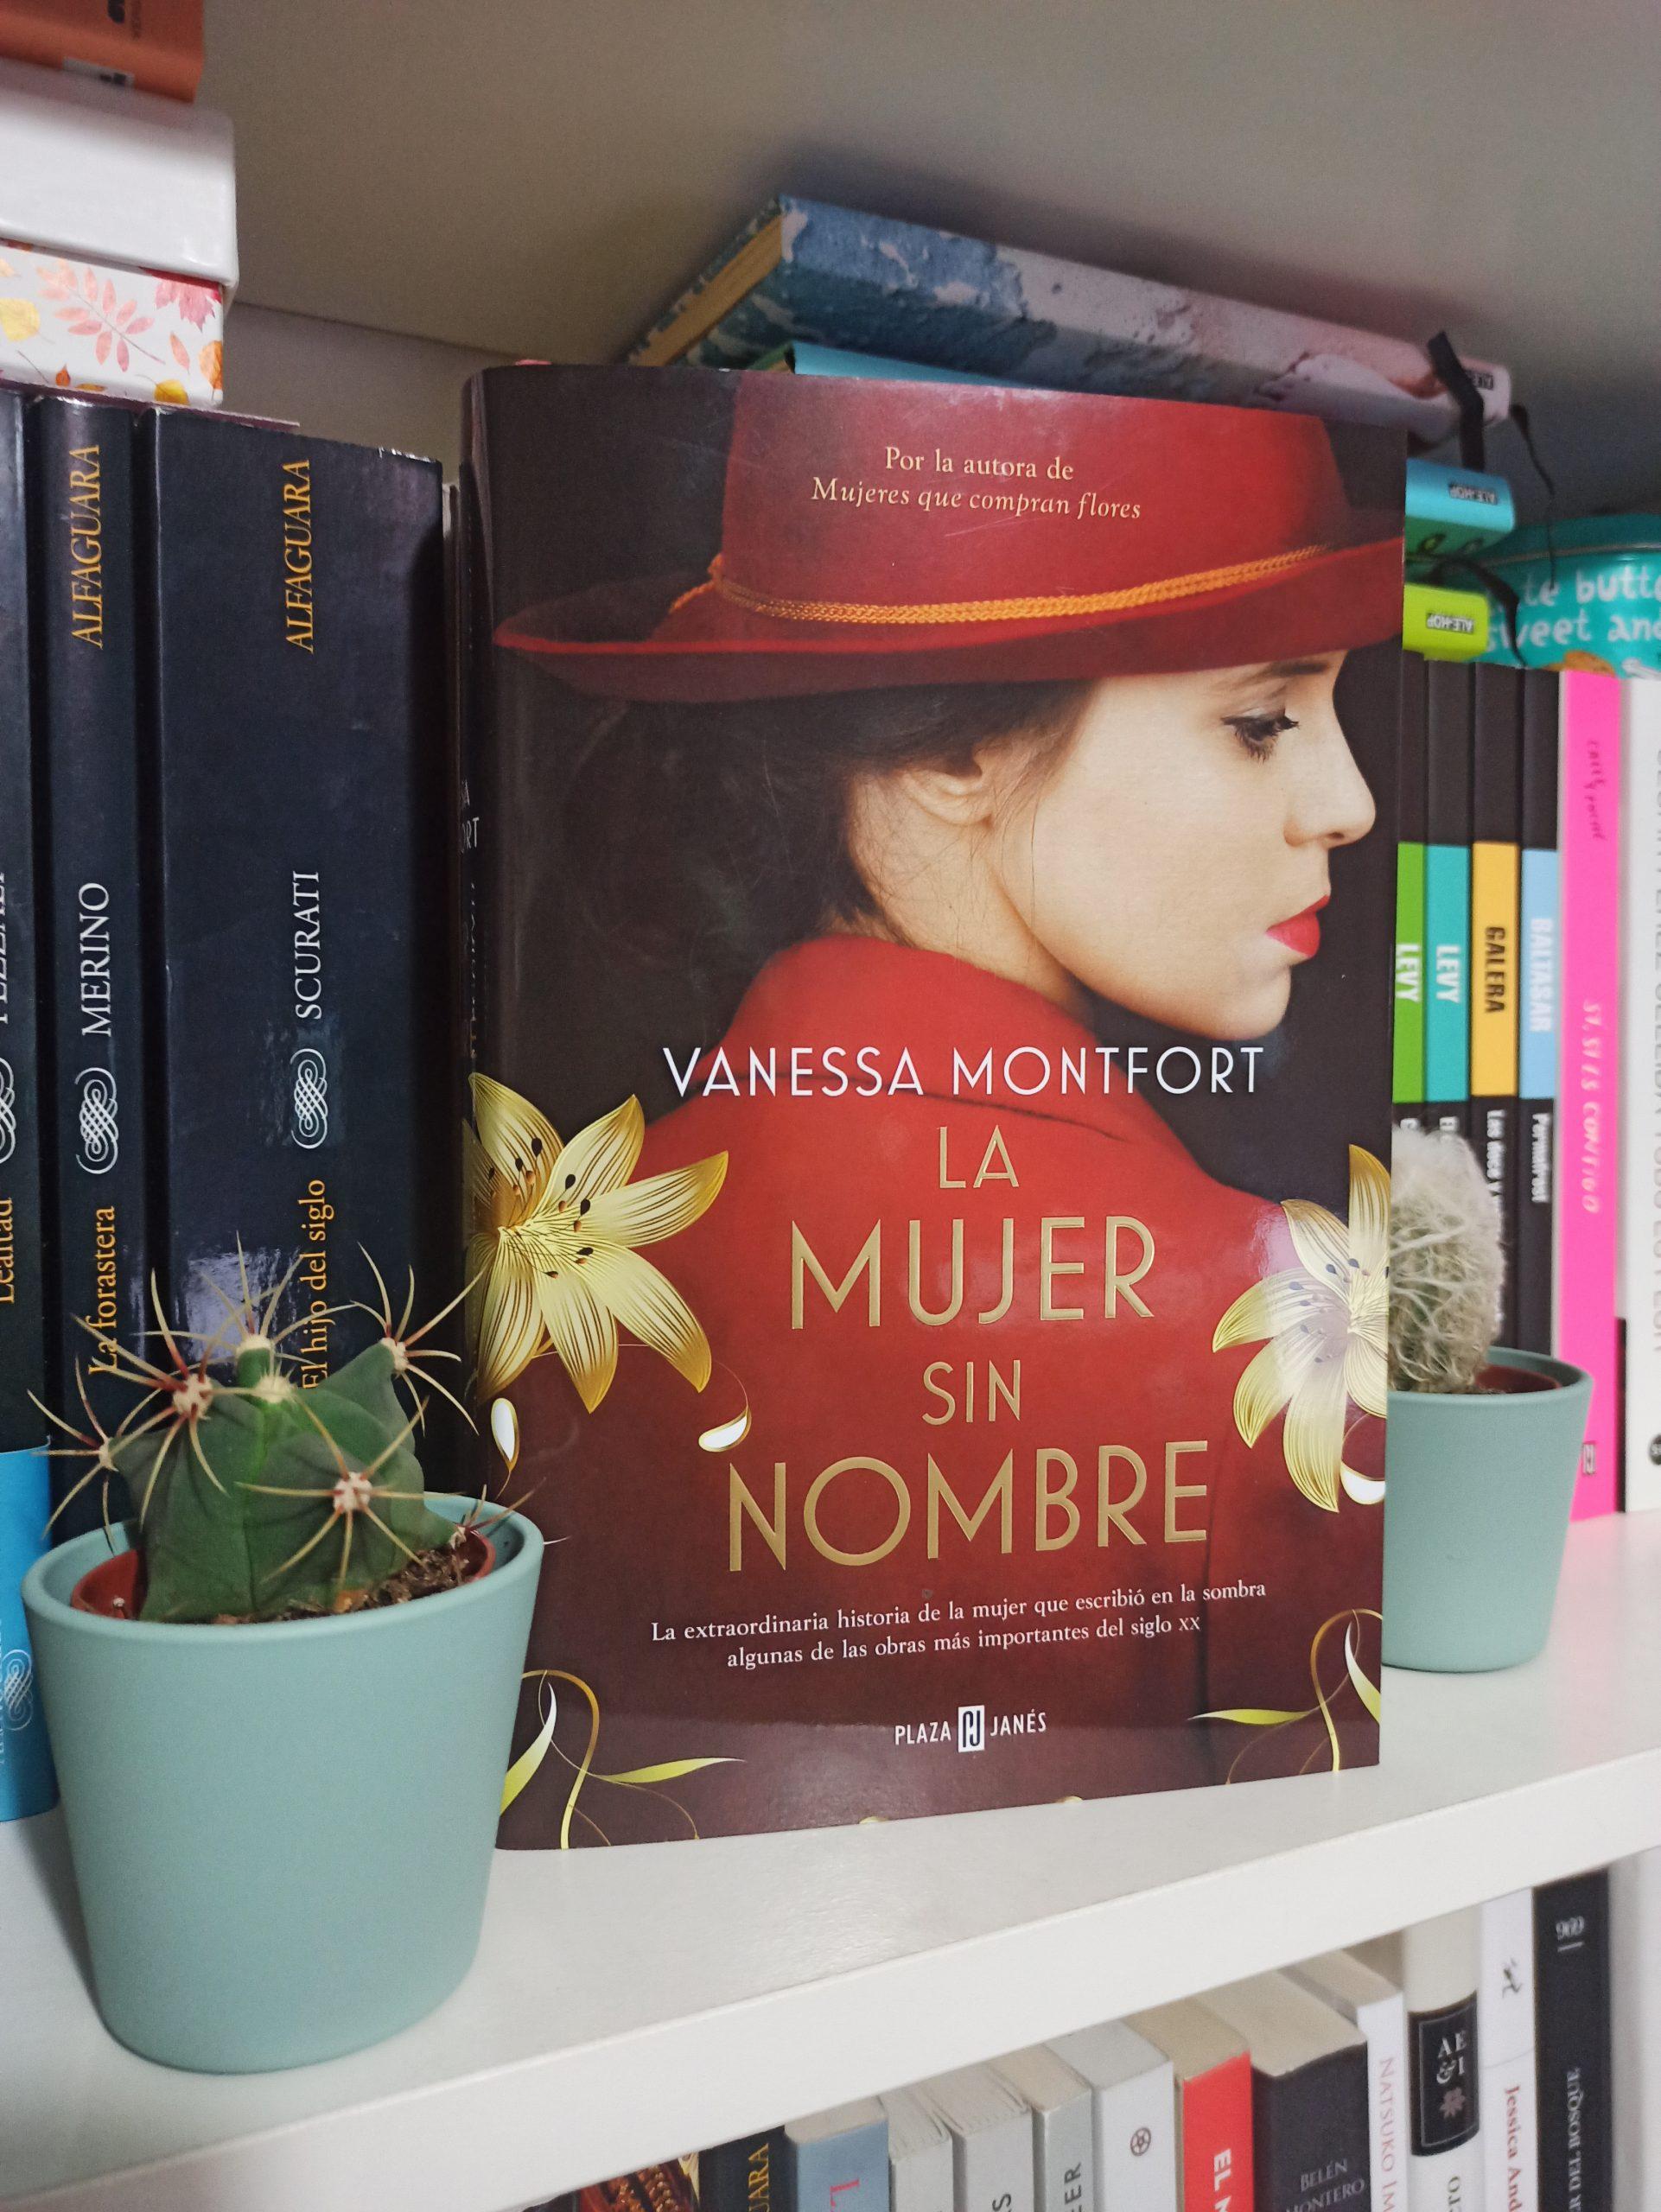 LA MUJER SIN NOMBRE, de Vanessa Monfort.